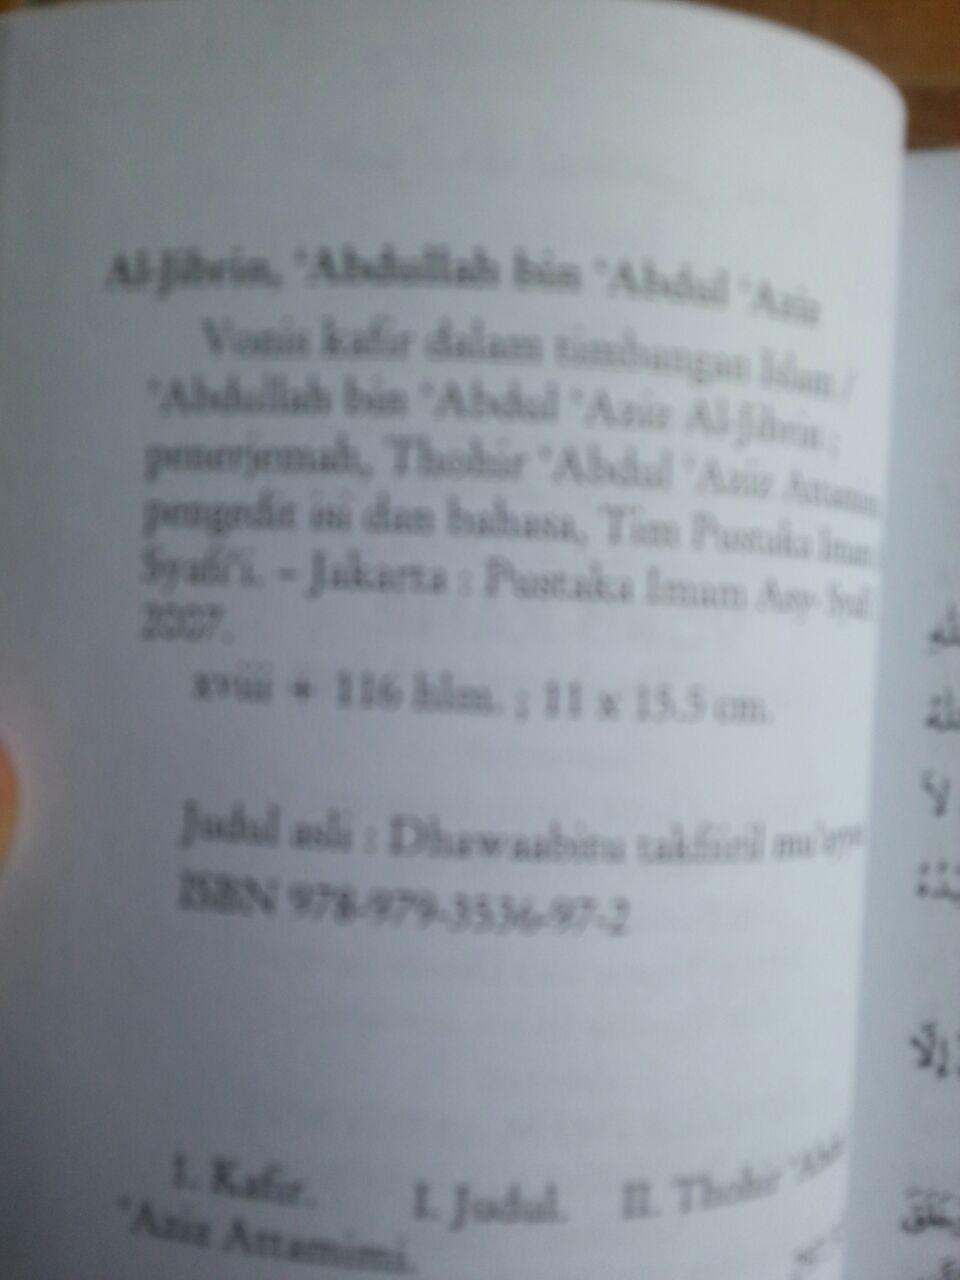 Buku Vonis Kafir Dalam Timbangan Islam isi